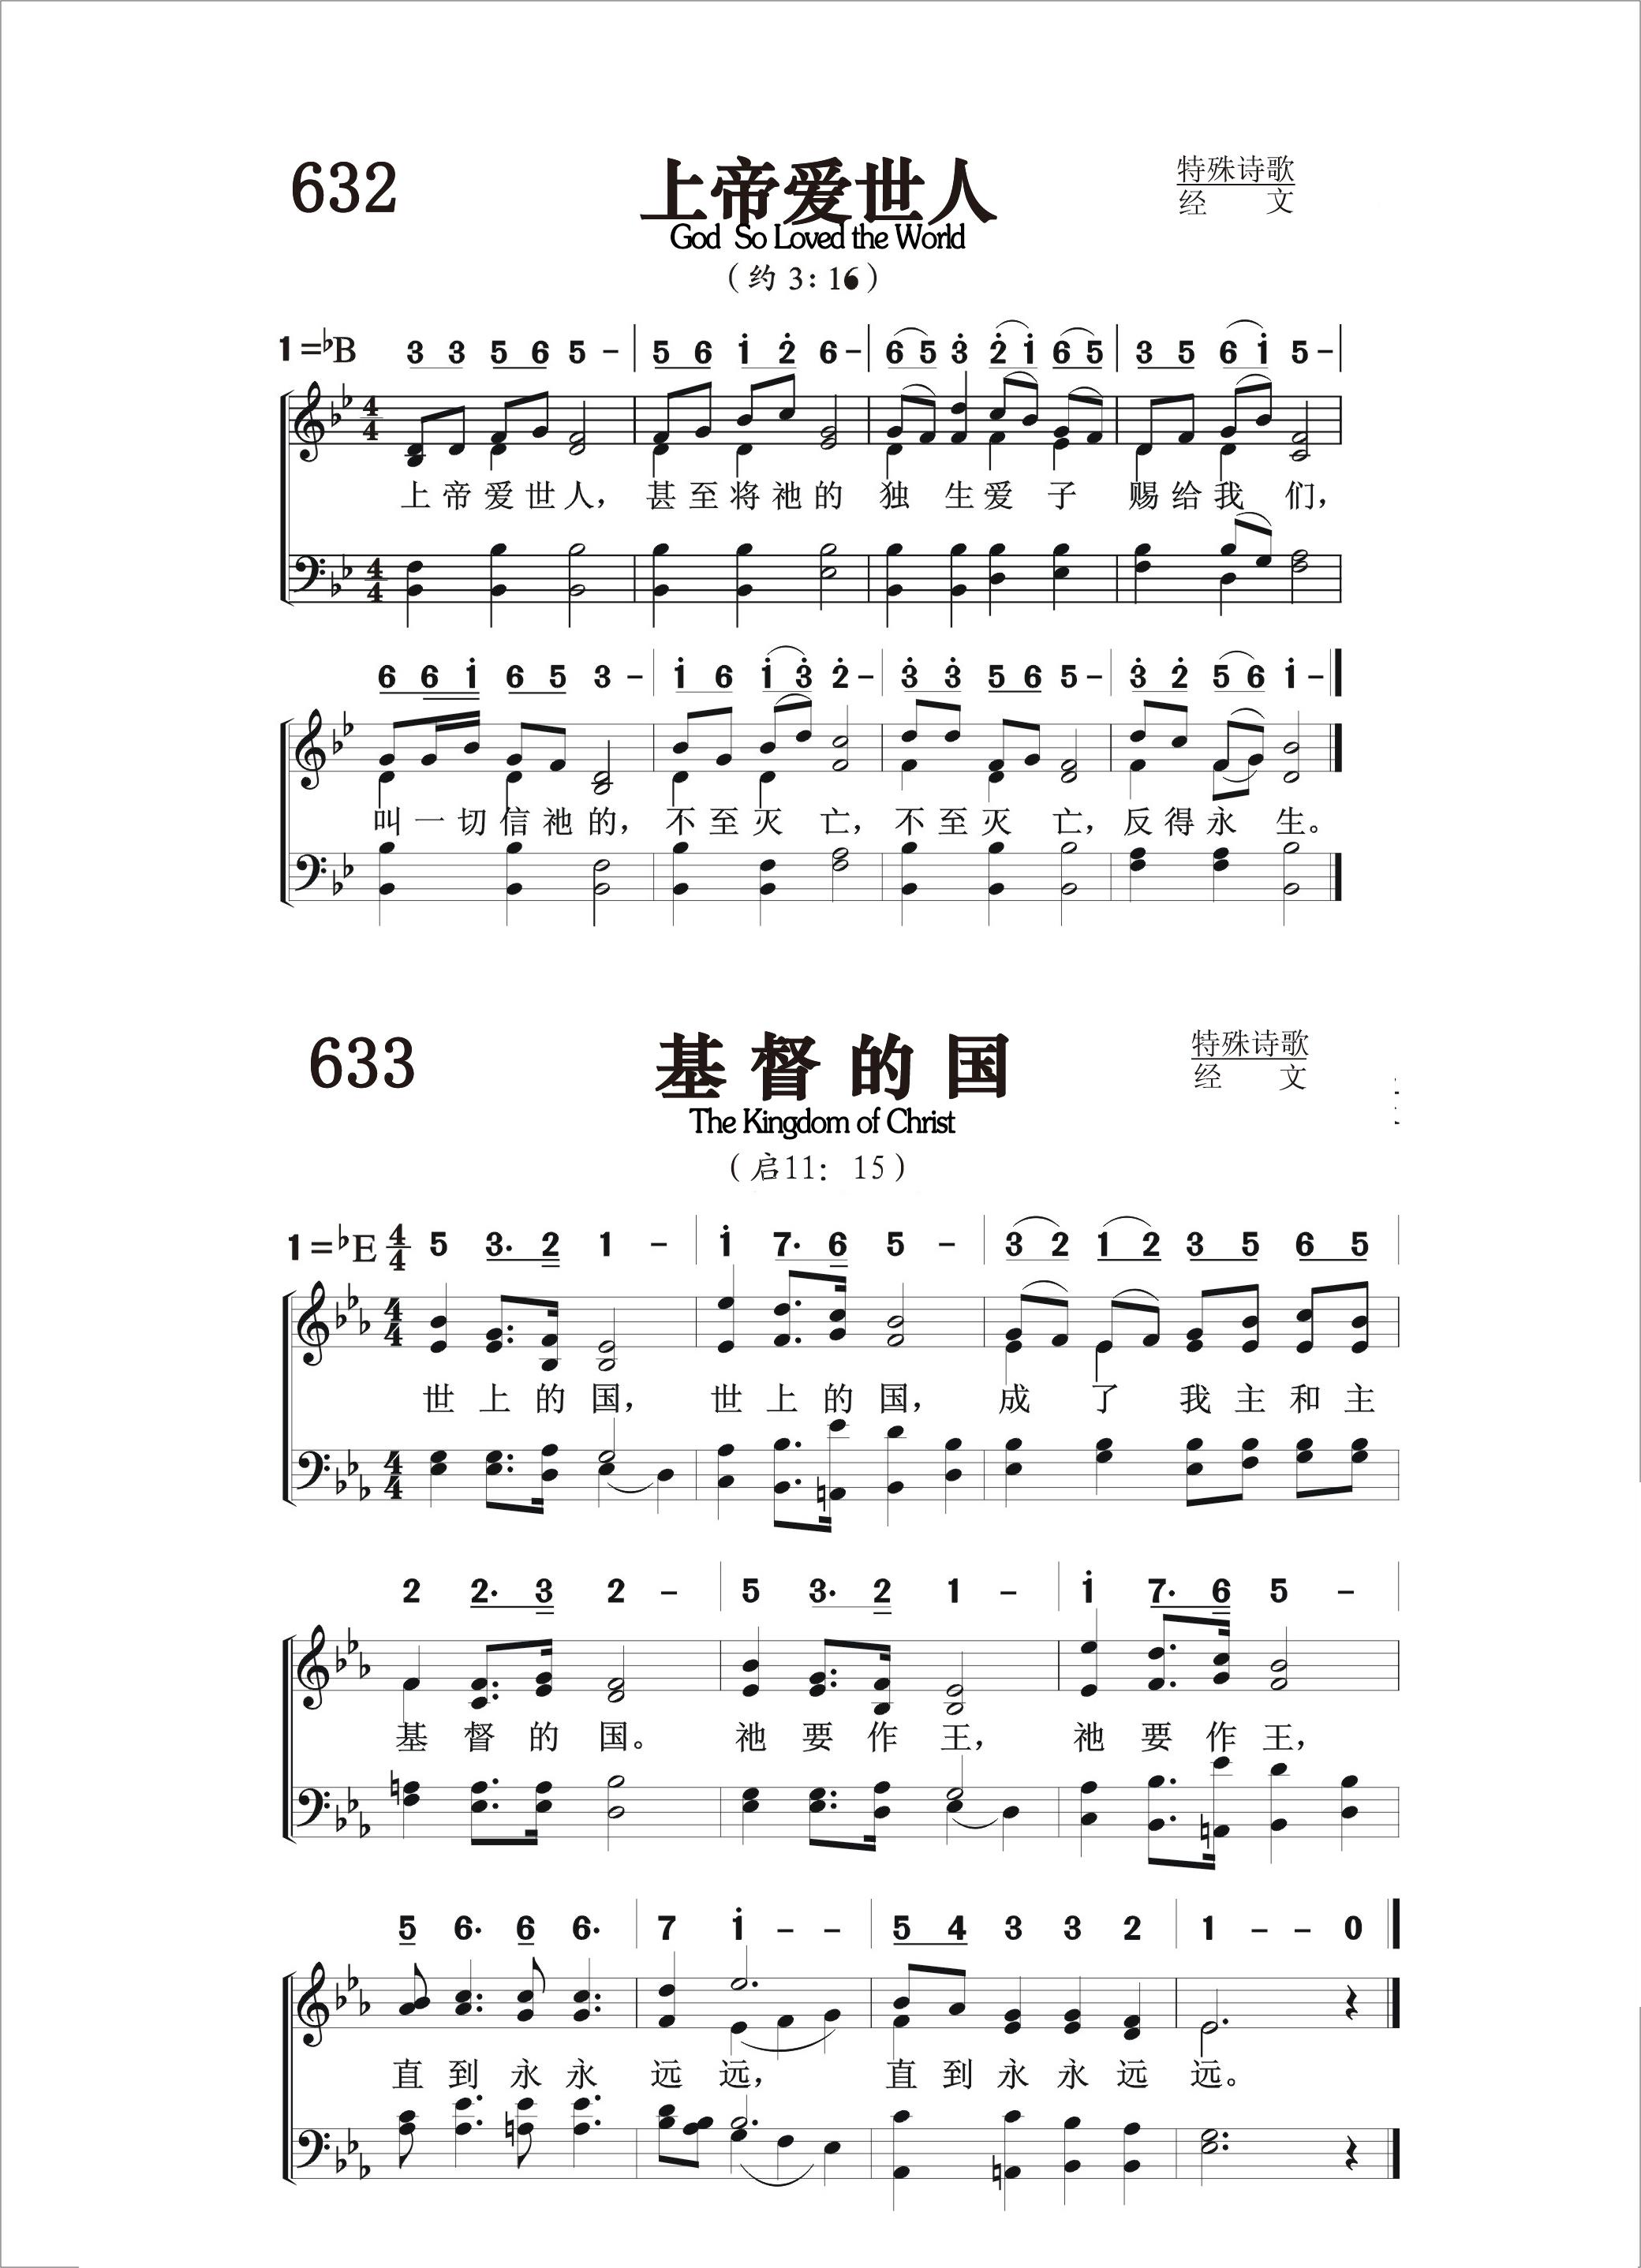 633 Sda Hymnal